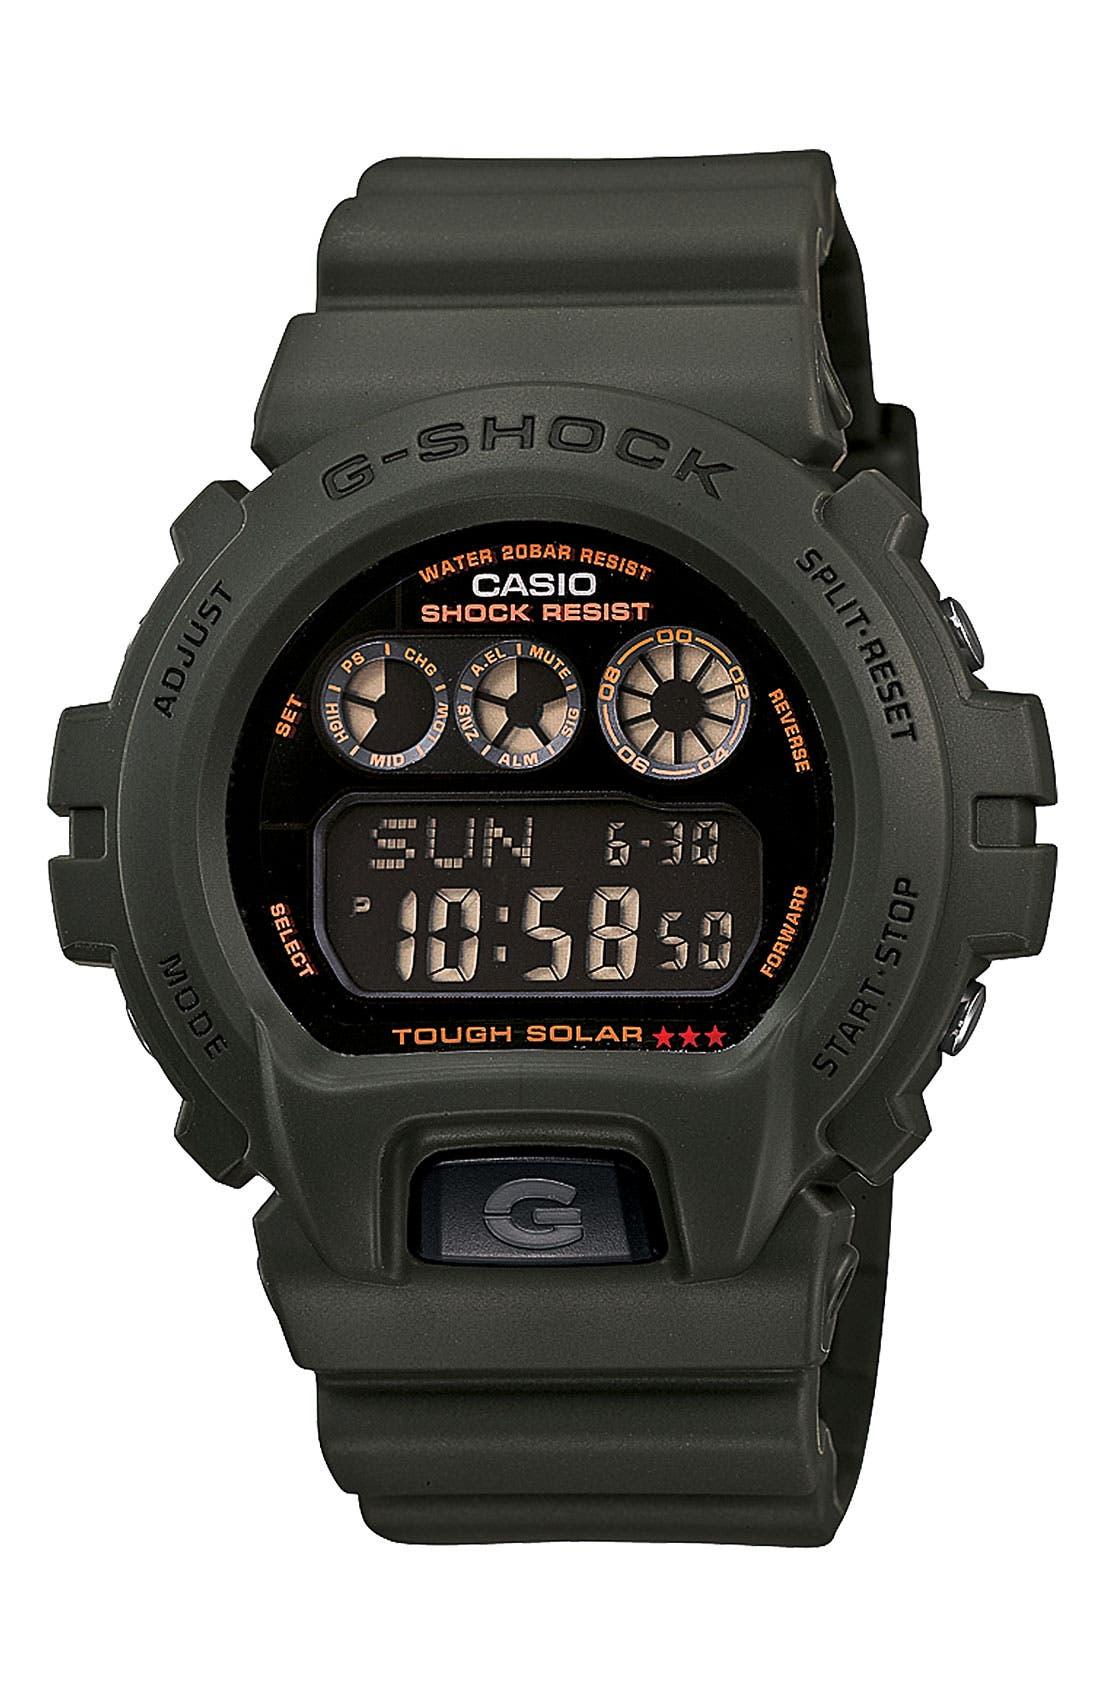 Alternate Image 1 Selected - G-Shock 'Solar' Digital Watch, 46mm x 43mm